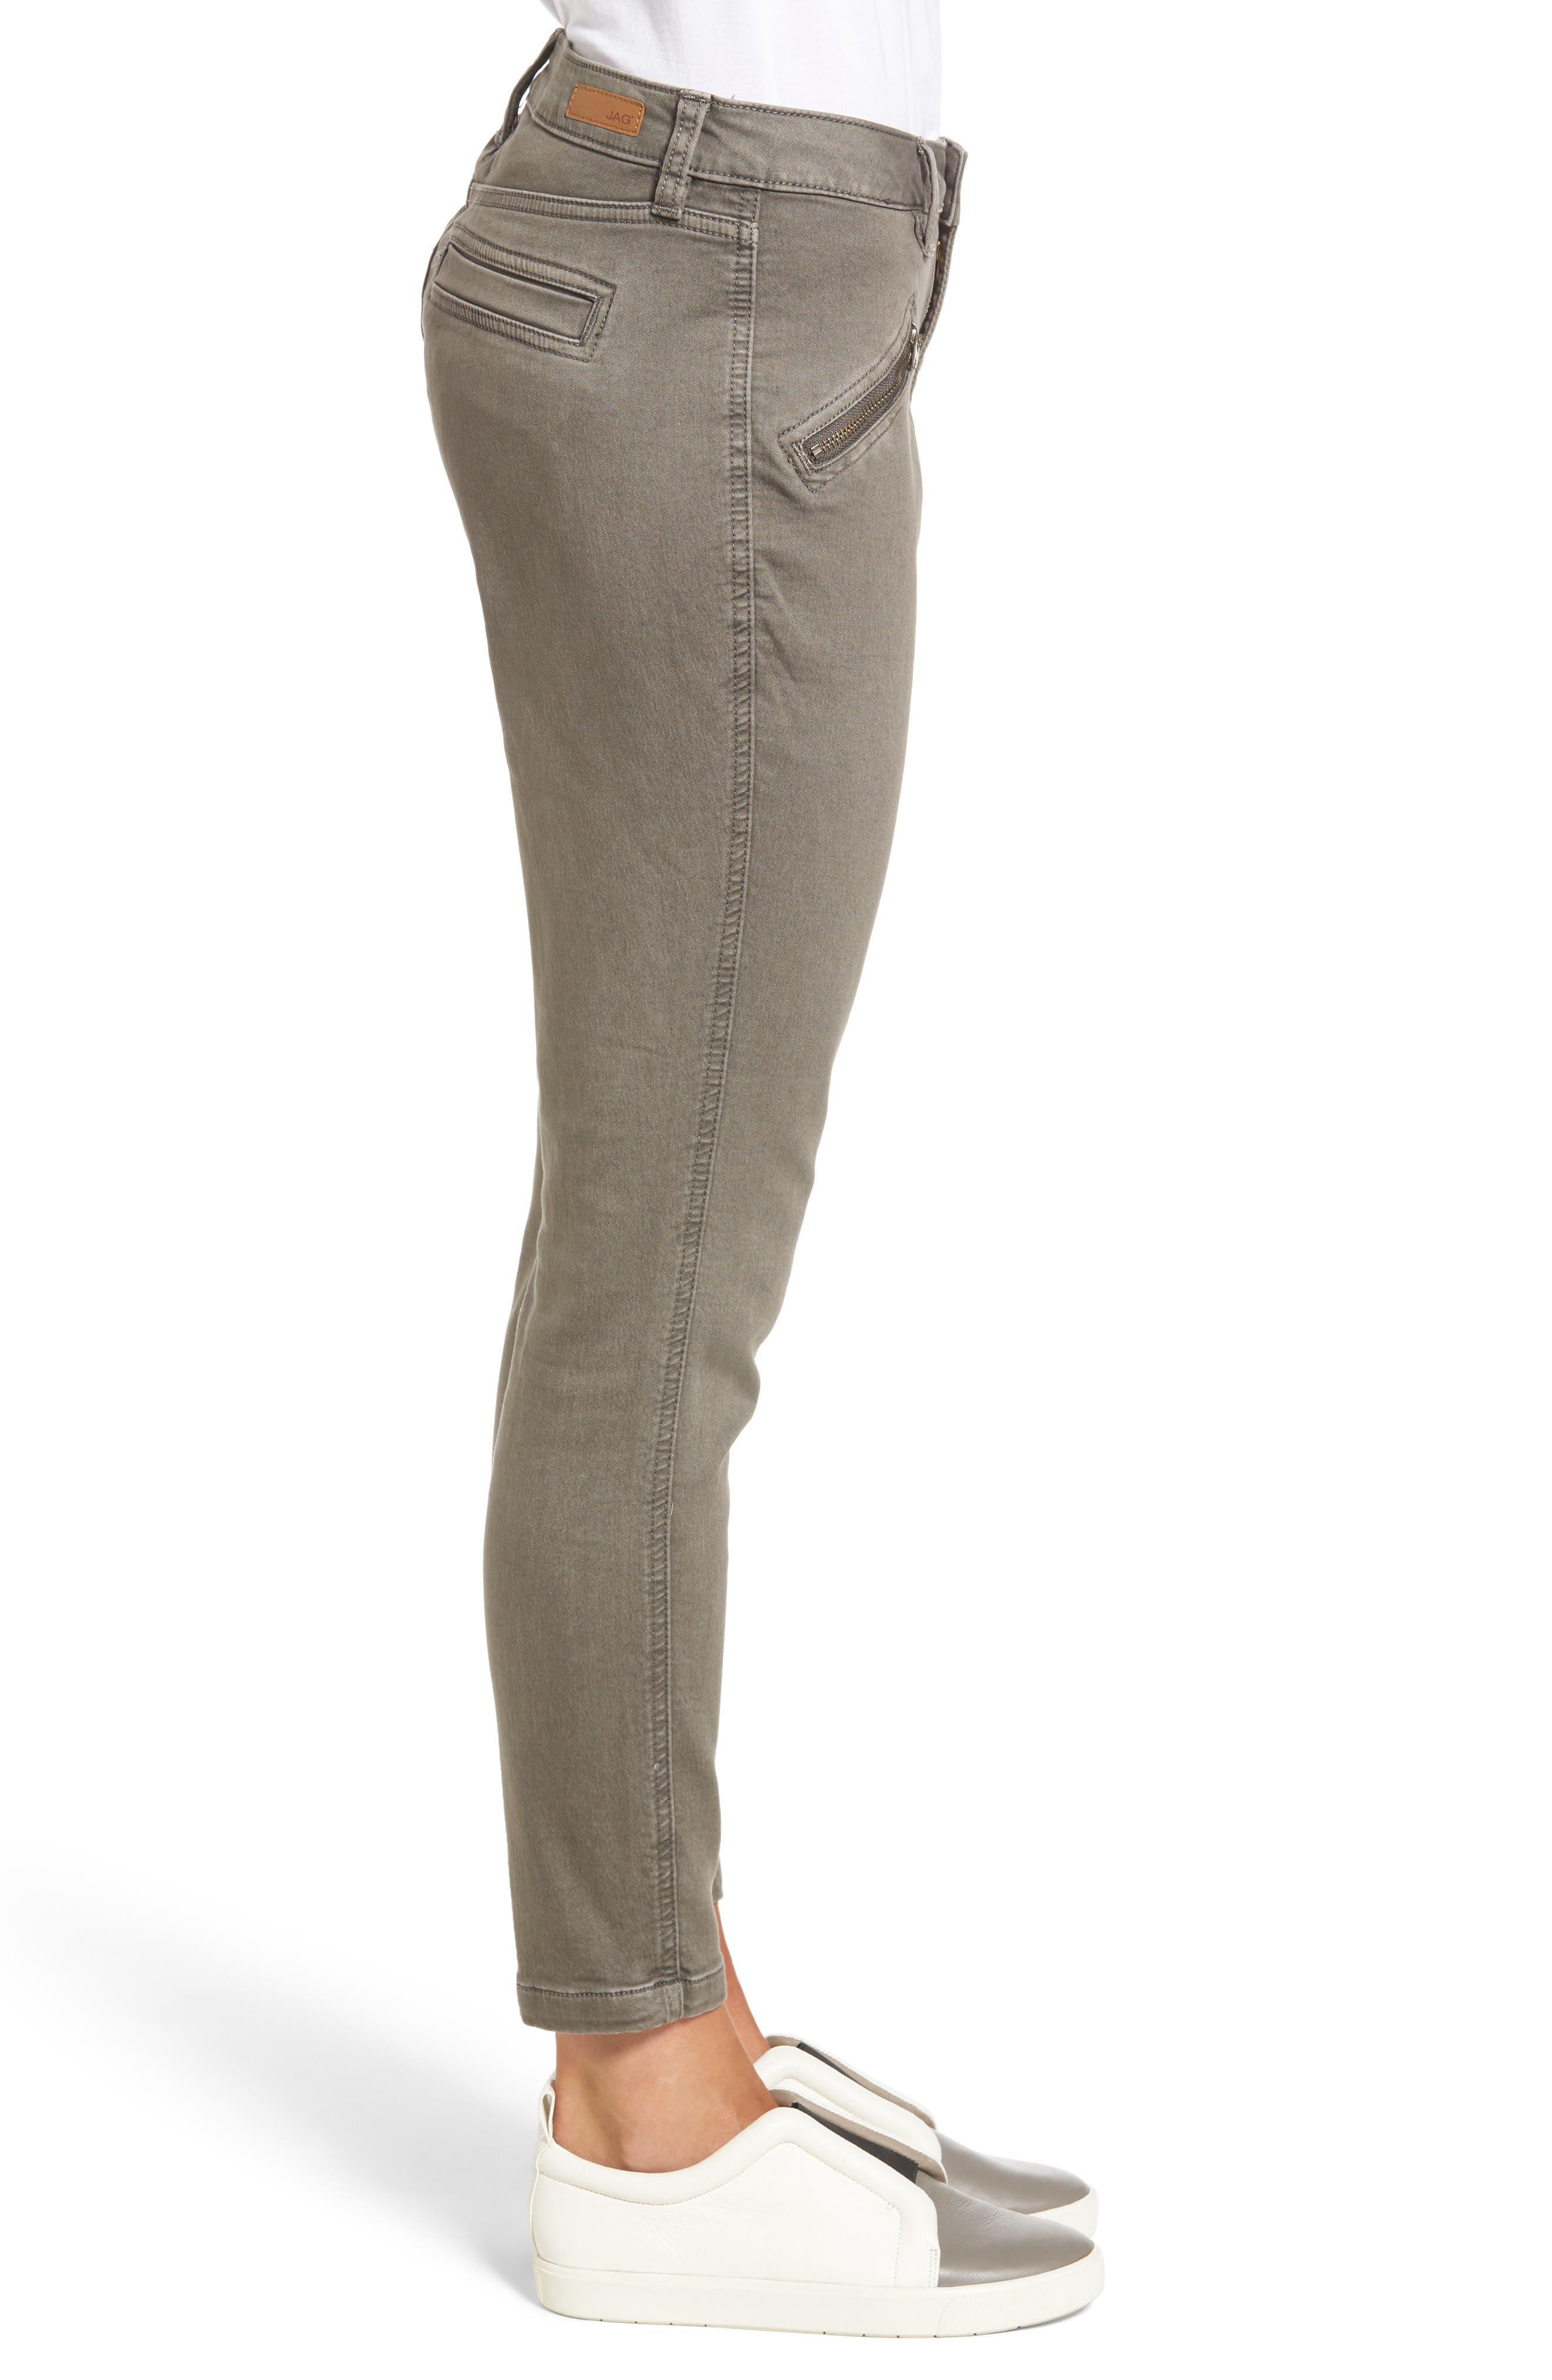 Alternate Image 3  - Jag Jeans Ryan Knit Skinny Jeans (Lava Rock)